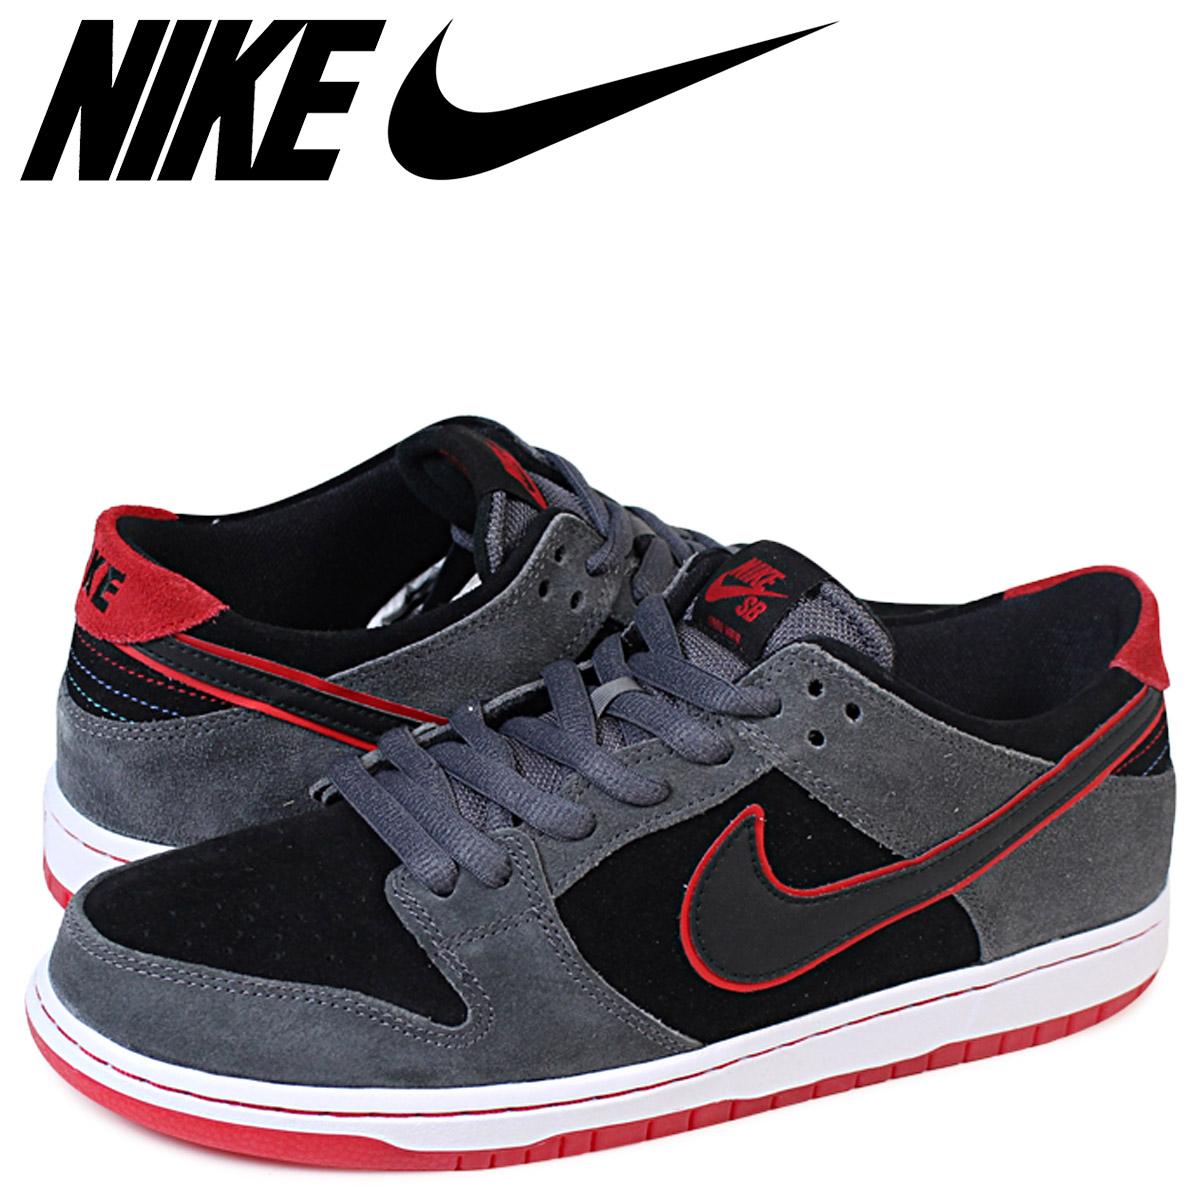 huge discount 459dc 39bb6 NIKE SB Nike dunk sneakers men DUNK LOW PRO ISHOD WAIR 895,969-006 gray